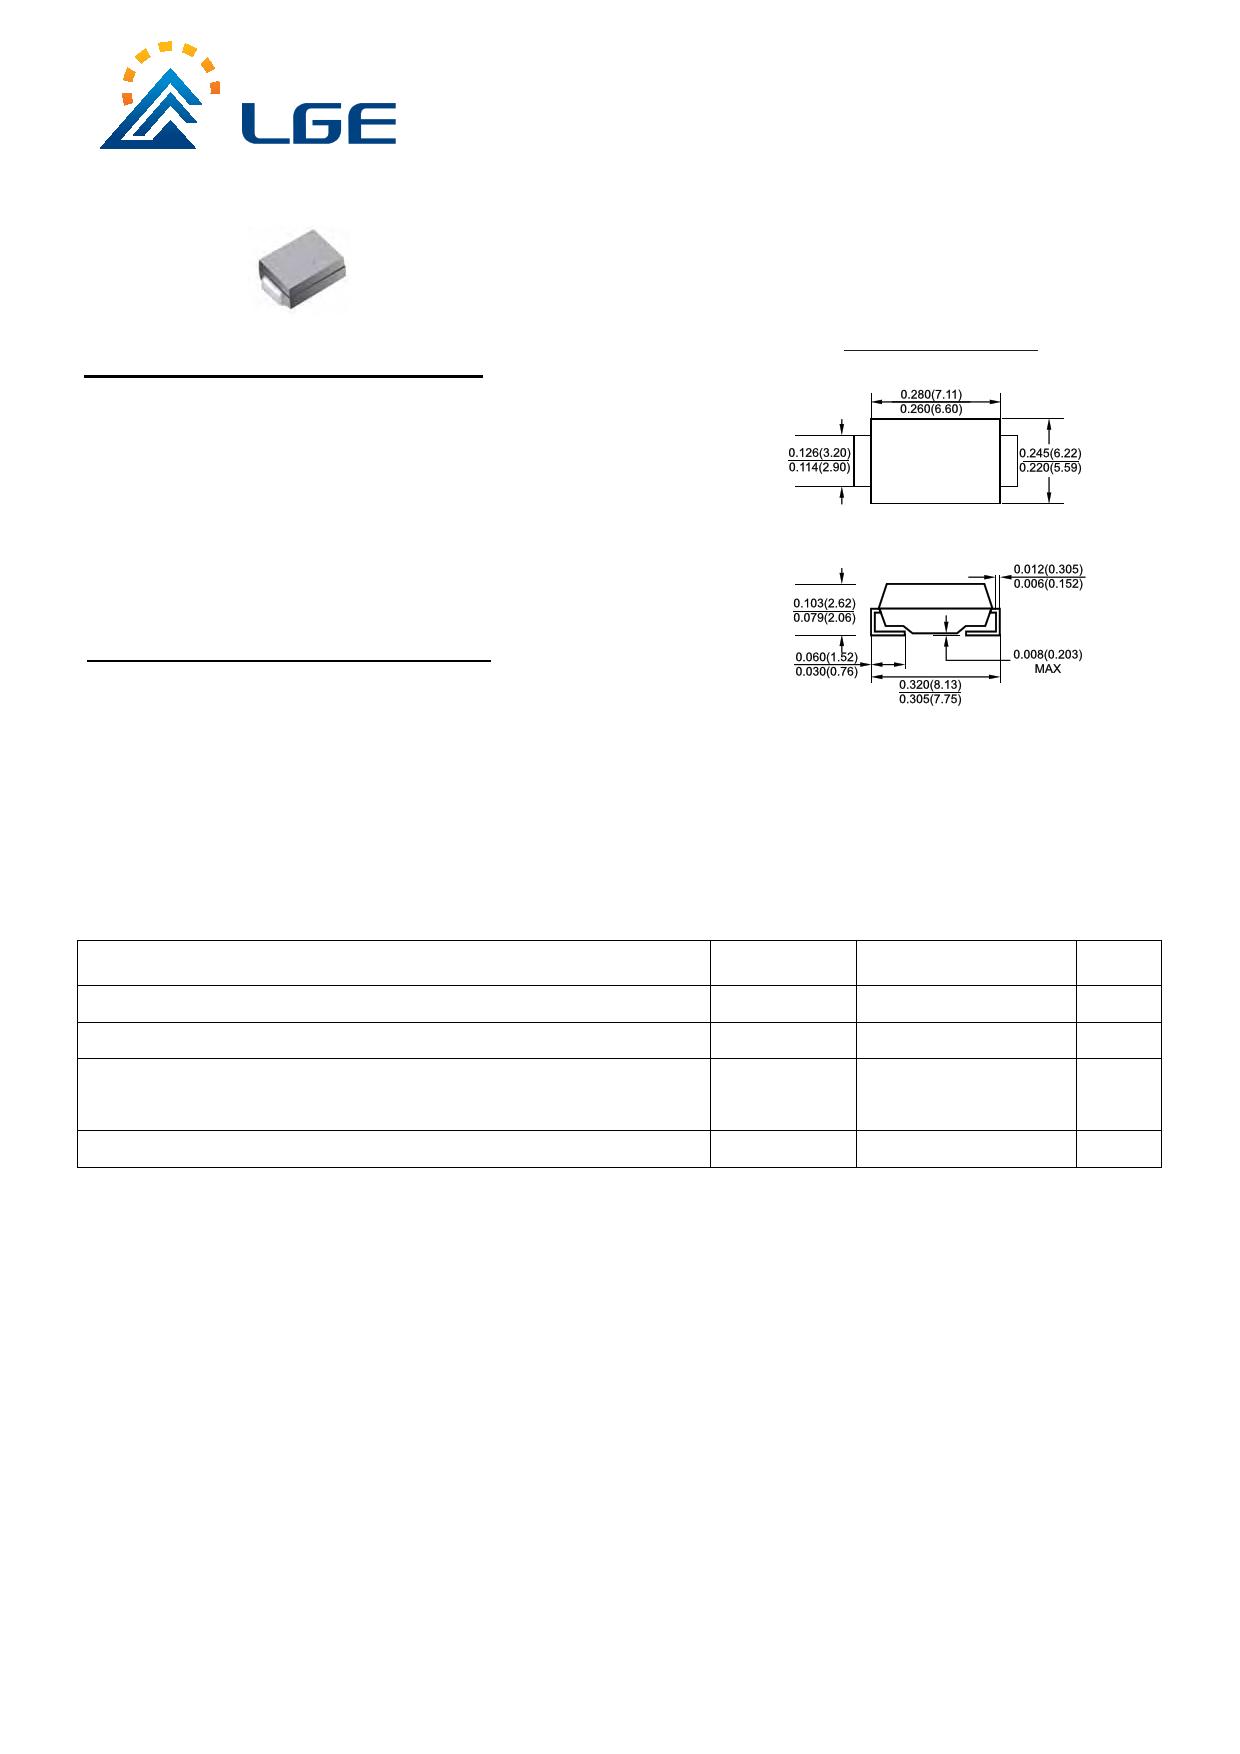 3.0SMCJ16CA Datasheet, 3.0SMCJ16CA PDF,ピン配置, 機能